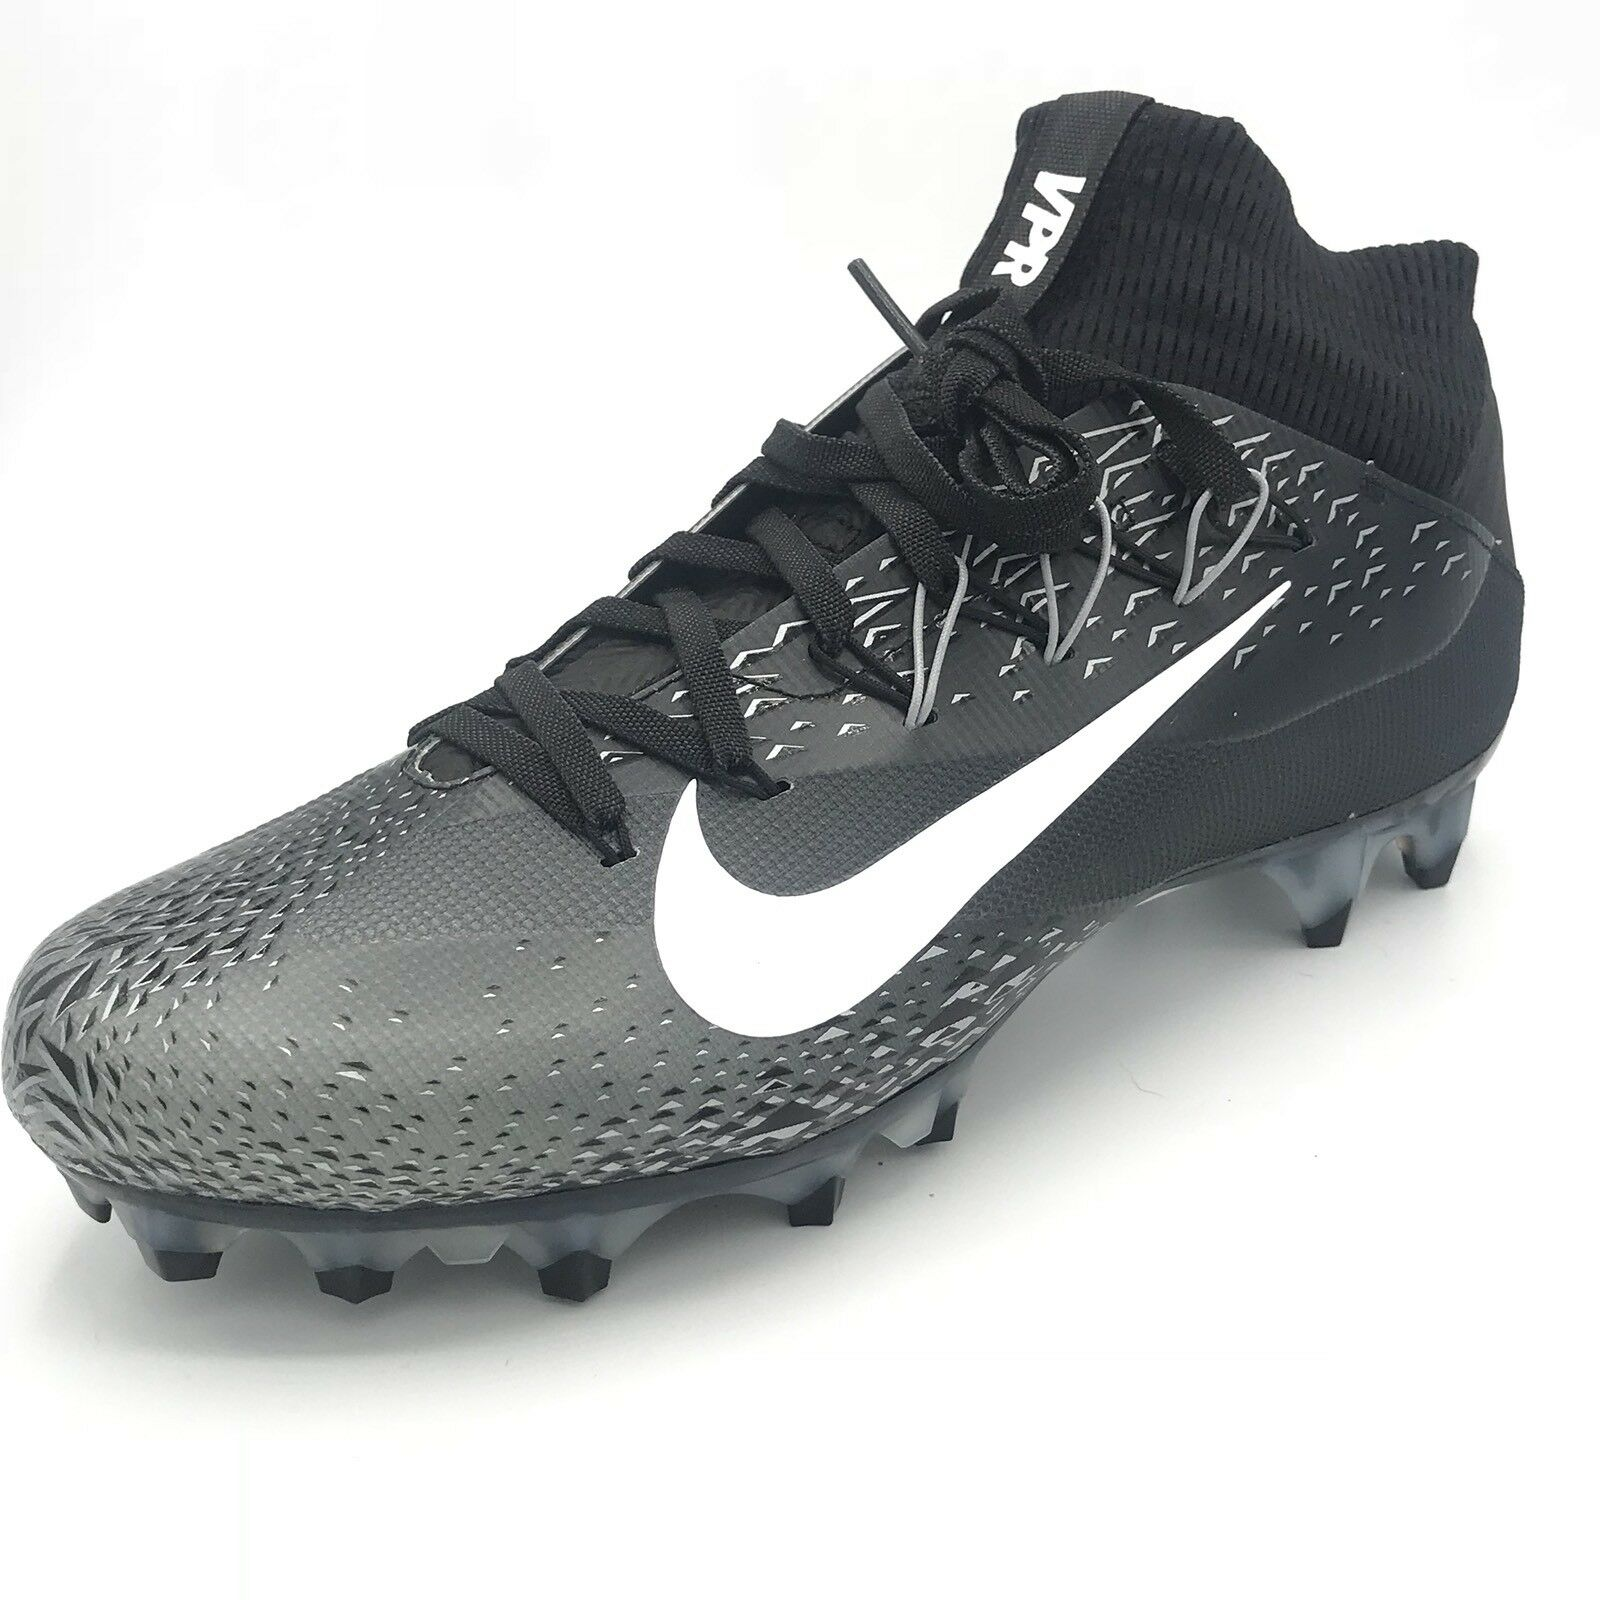 Nike Vapor Untouchable 2 Football Cleats 824470-001 Men's Sz 10.5